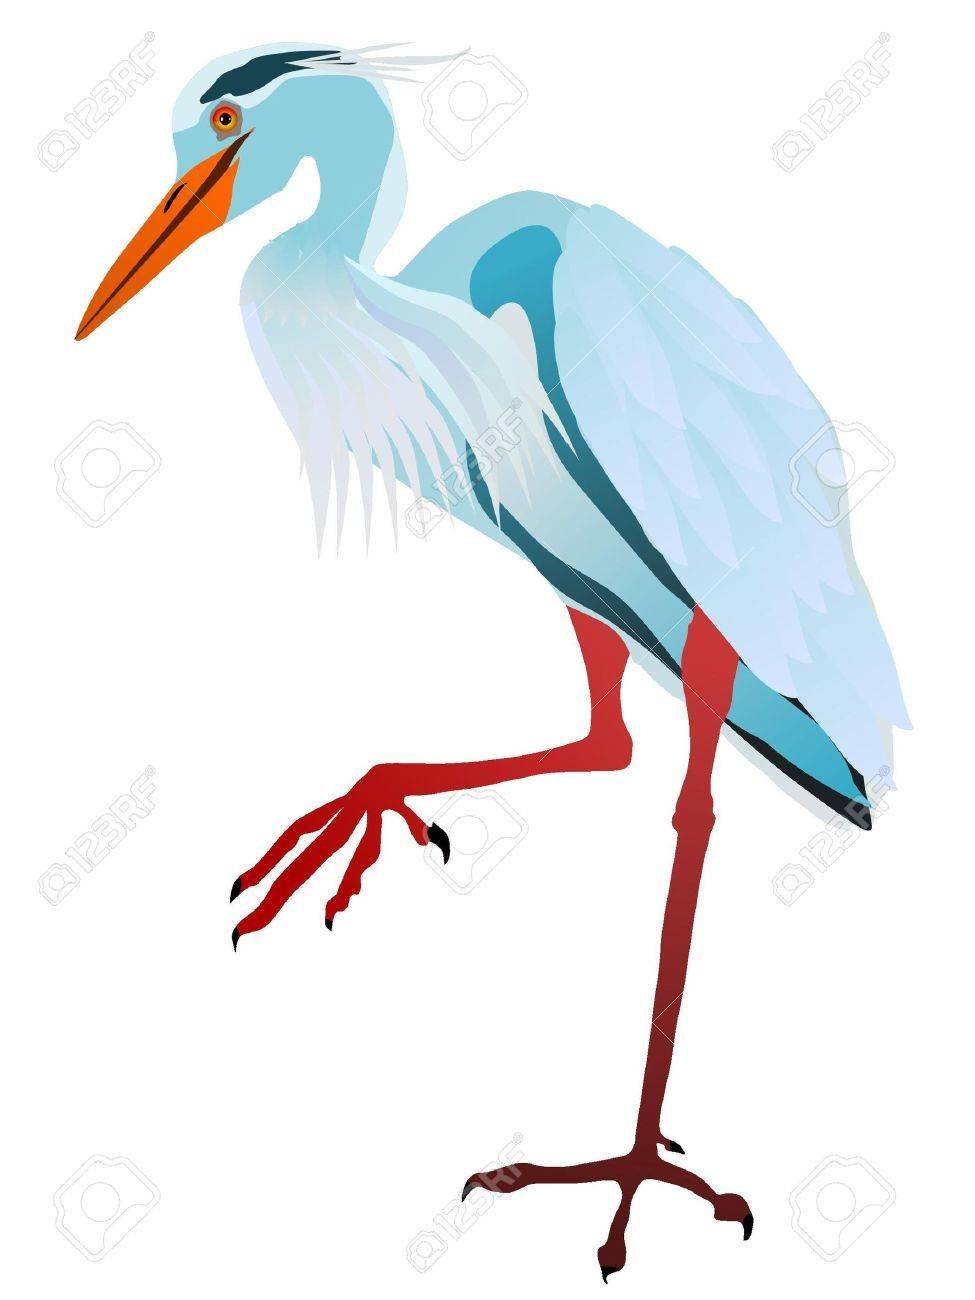 2 422 heron stock illustrations cliparts and royalty free heron vectors rh 123rf com blue heron clipart heron bird clipart